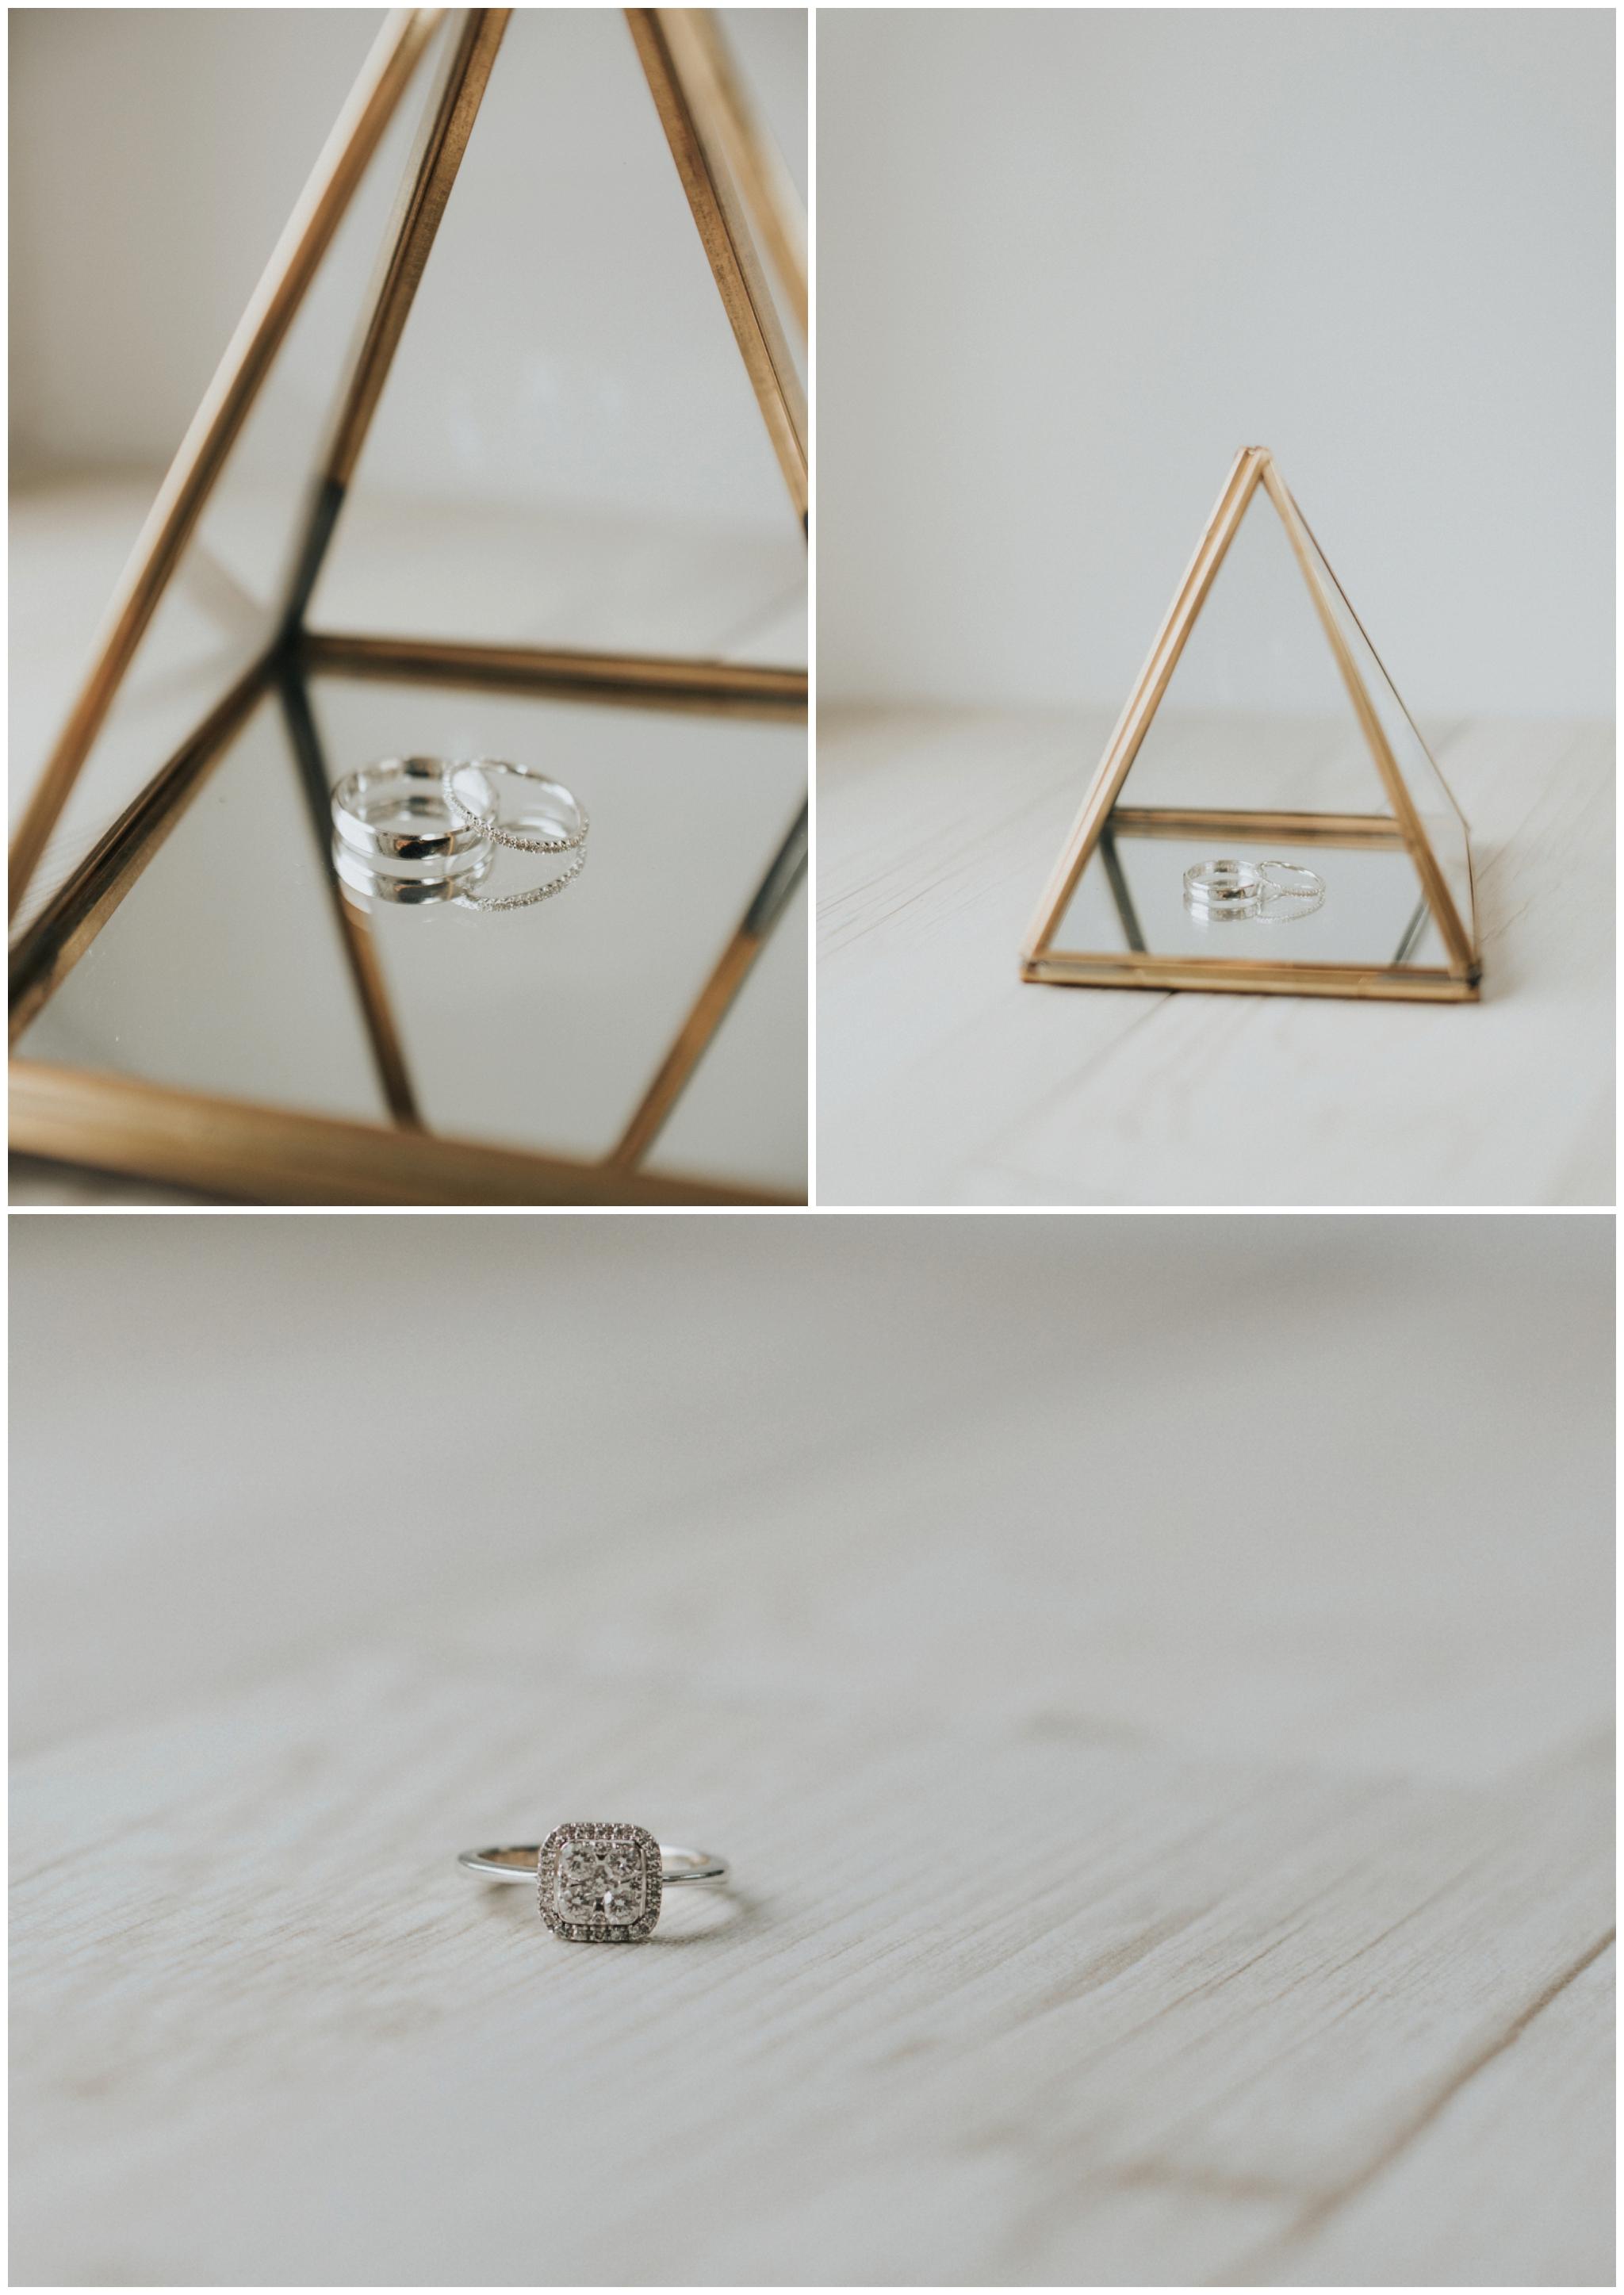 photographe-mariage-montagne-vercors-boho-folk-grenoble-annecy-alpes_0014